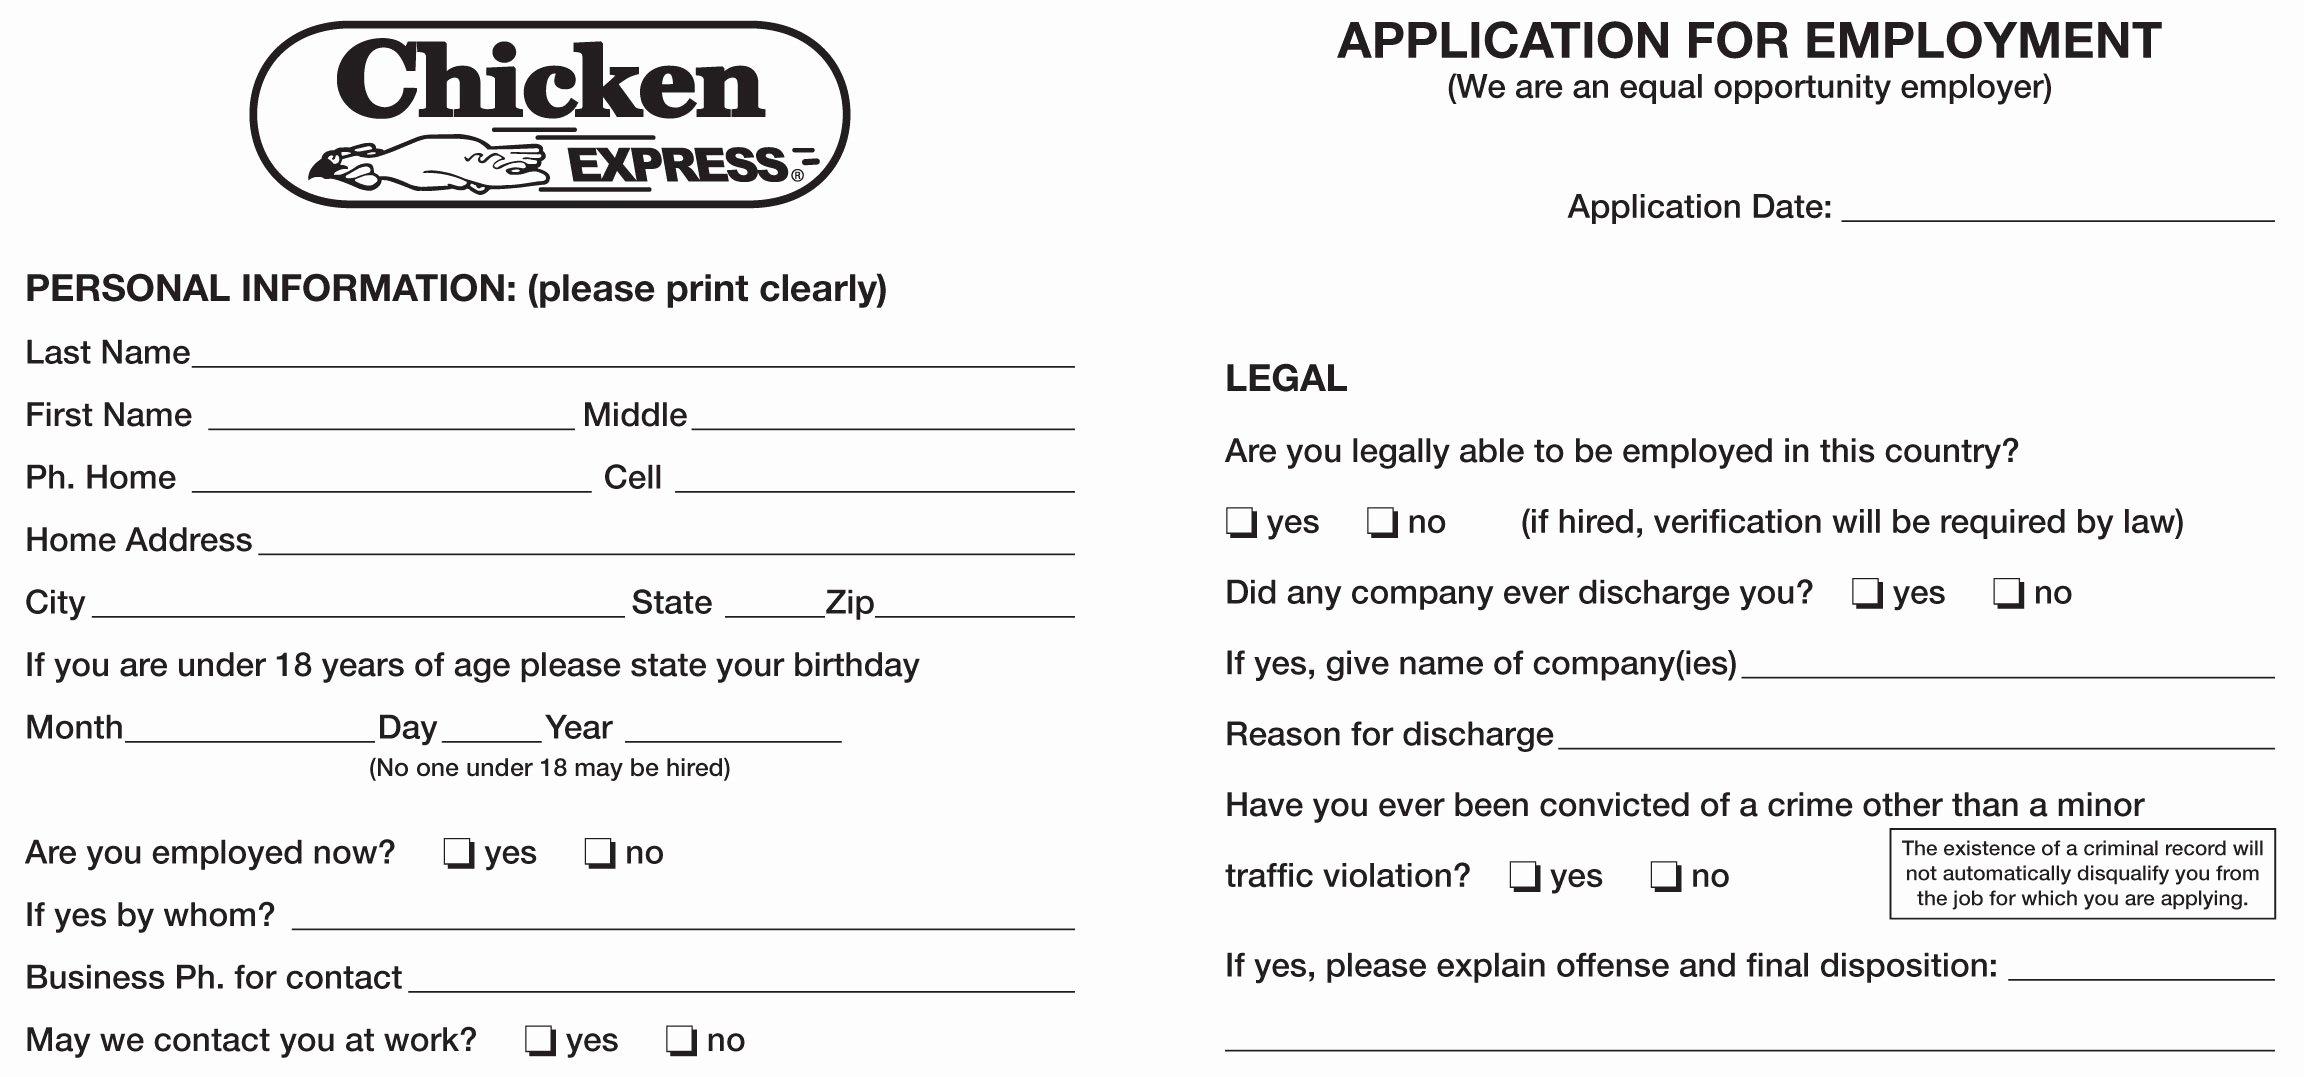 Job Application Sample Pdf Best Of Chicken Express Job Application Printable Employment Pdf